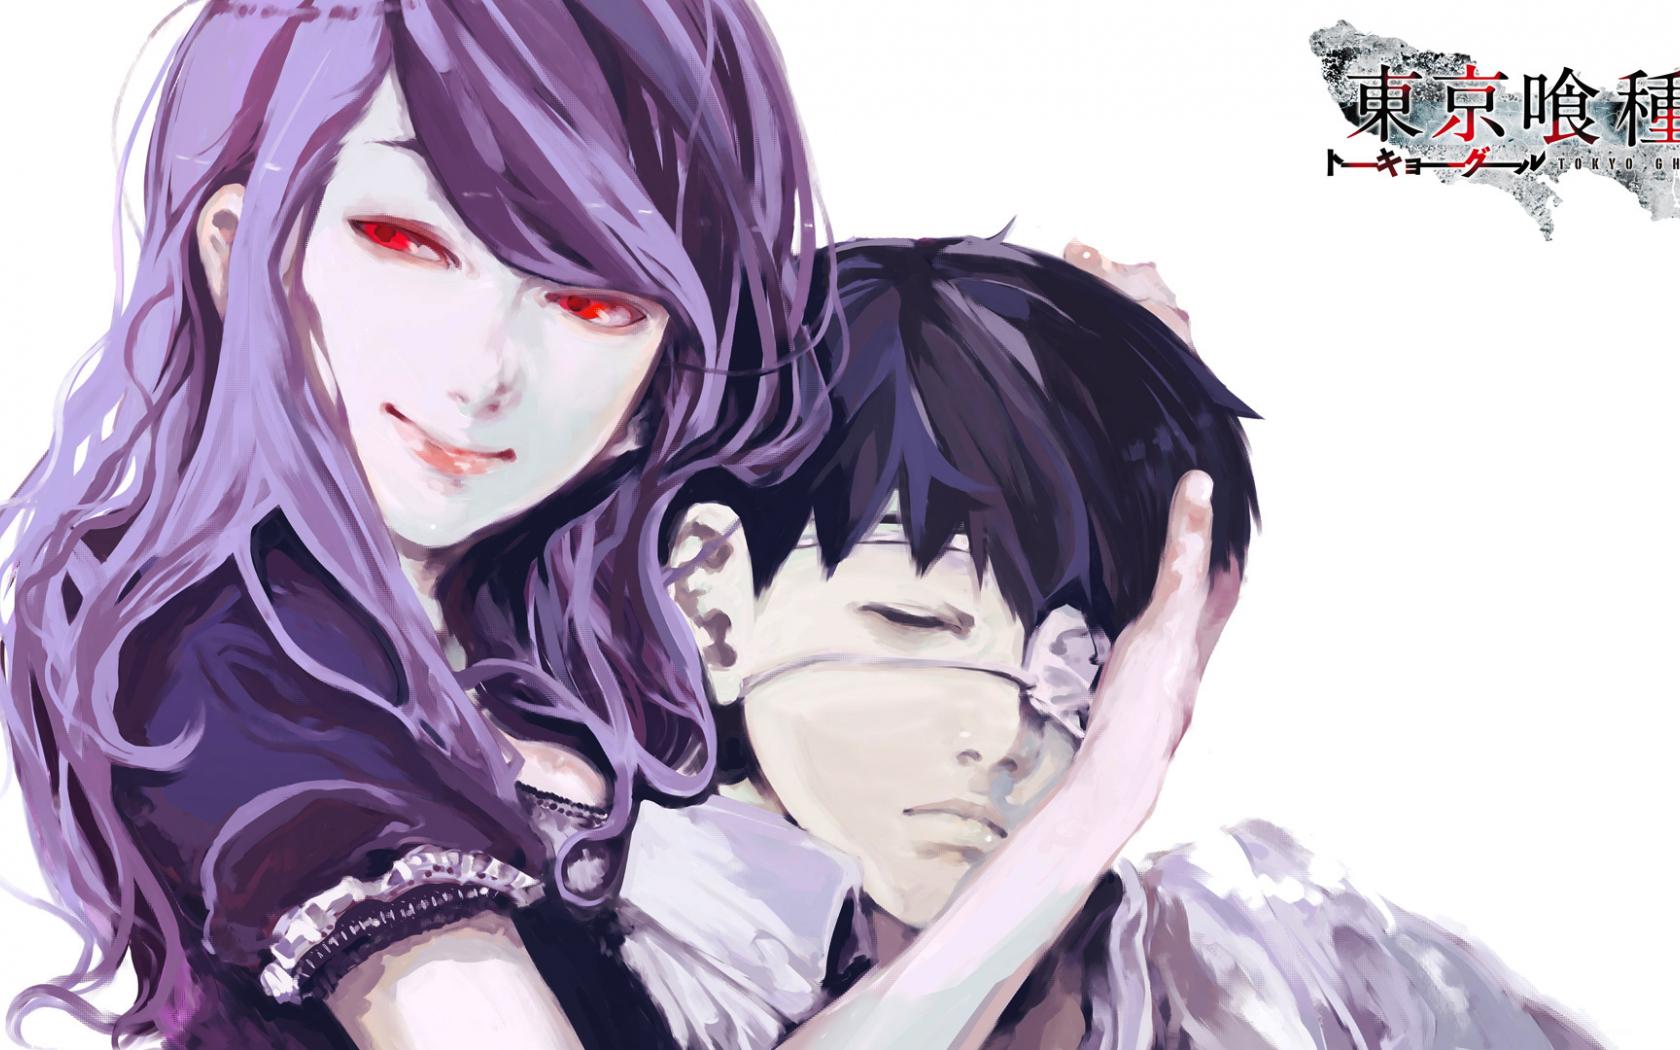 Free download rize kamishiro and ken kaneki tokyo ghoul